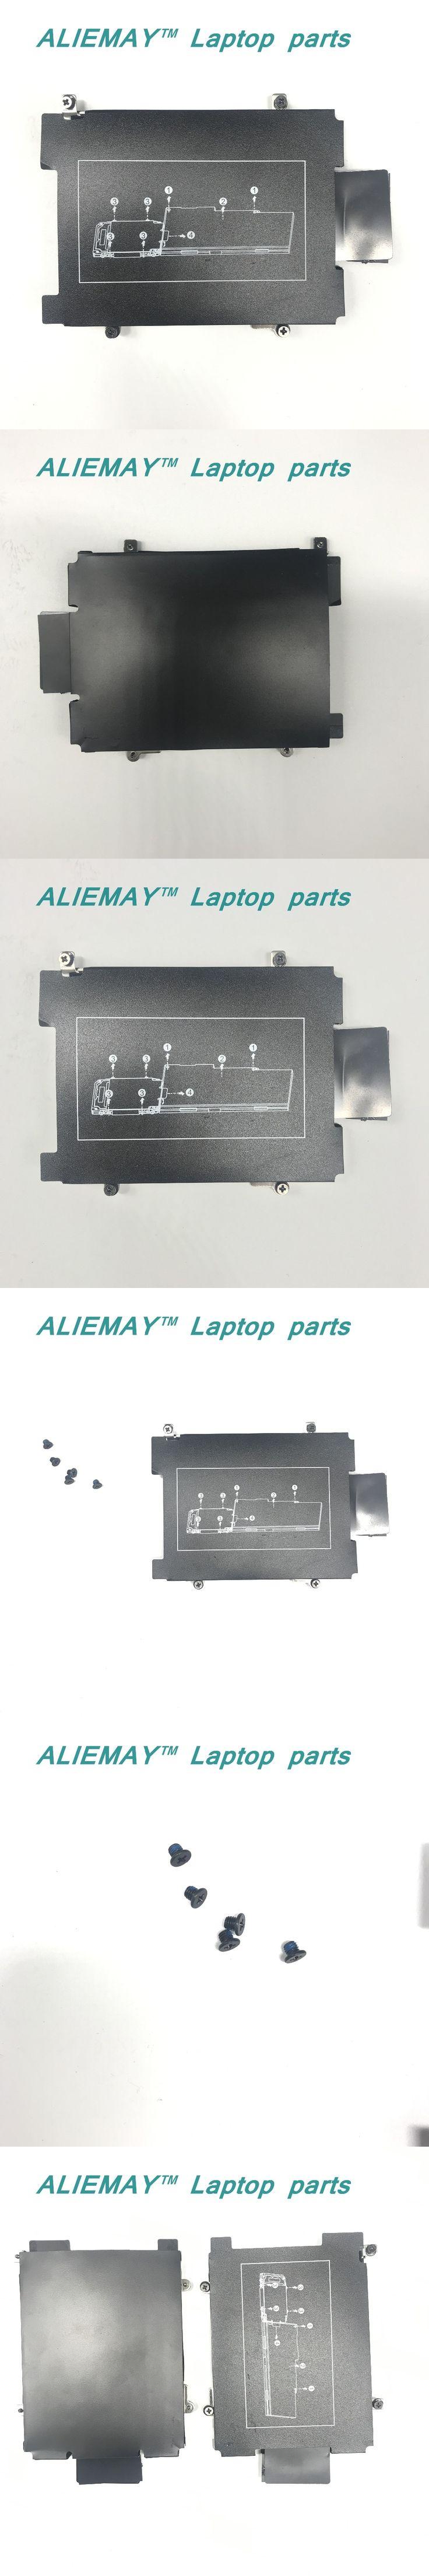 Laptop parts for HP Elitebook 840 850 740 745 820 720 725 g3 Zbook Z14 Z15 g3 Hard Drive HDD Caddy Frame Bracket w/Screws